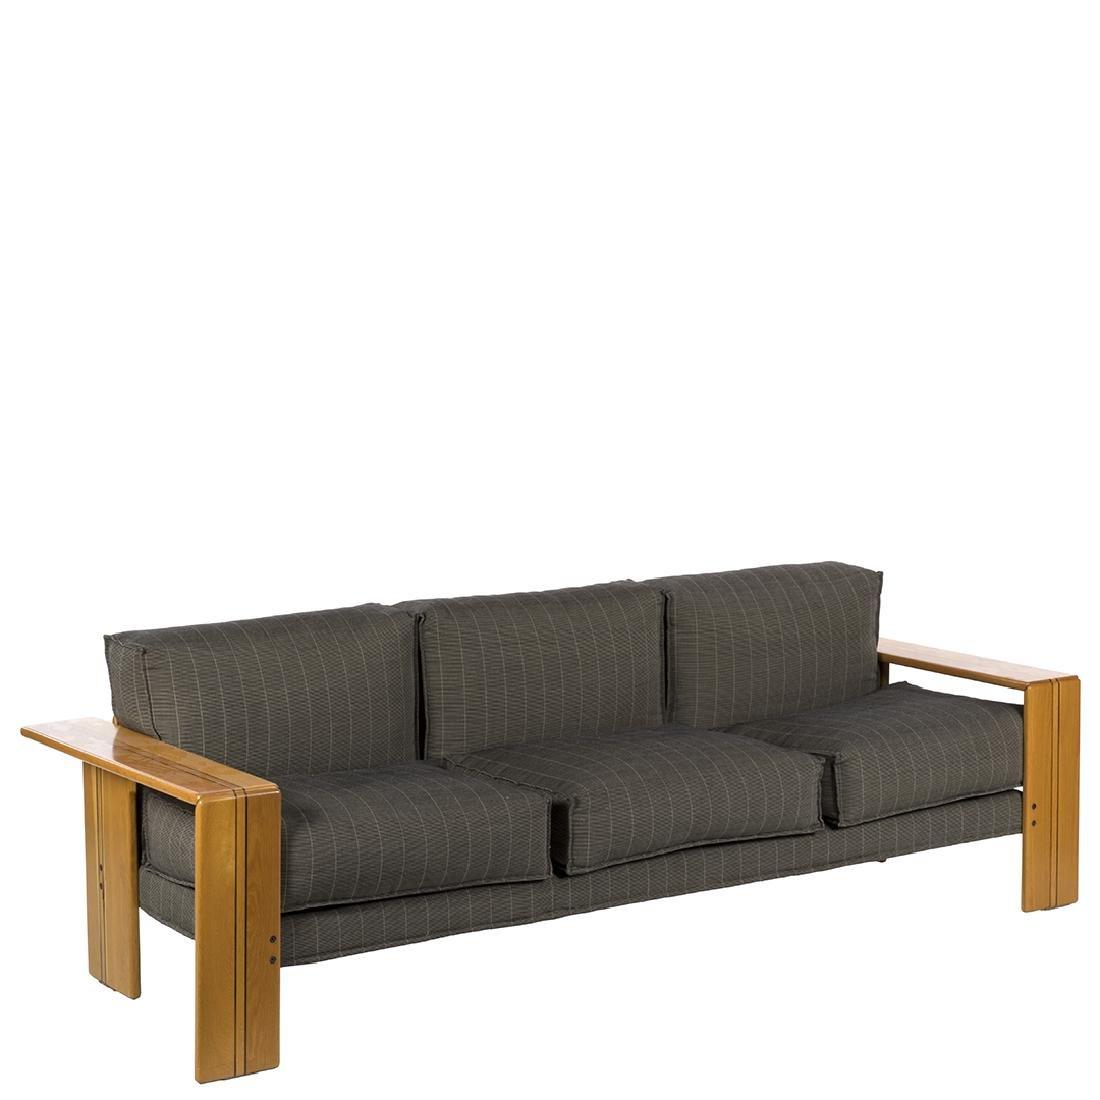 Tobia Scarpa Artona sofa